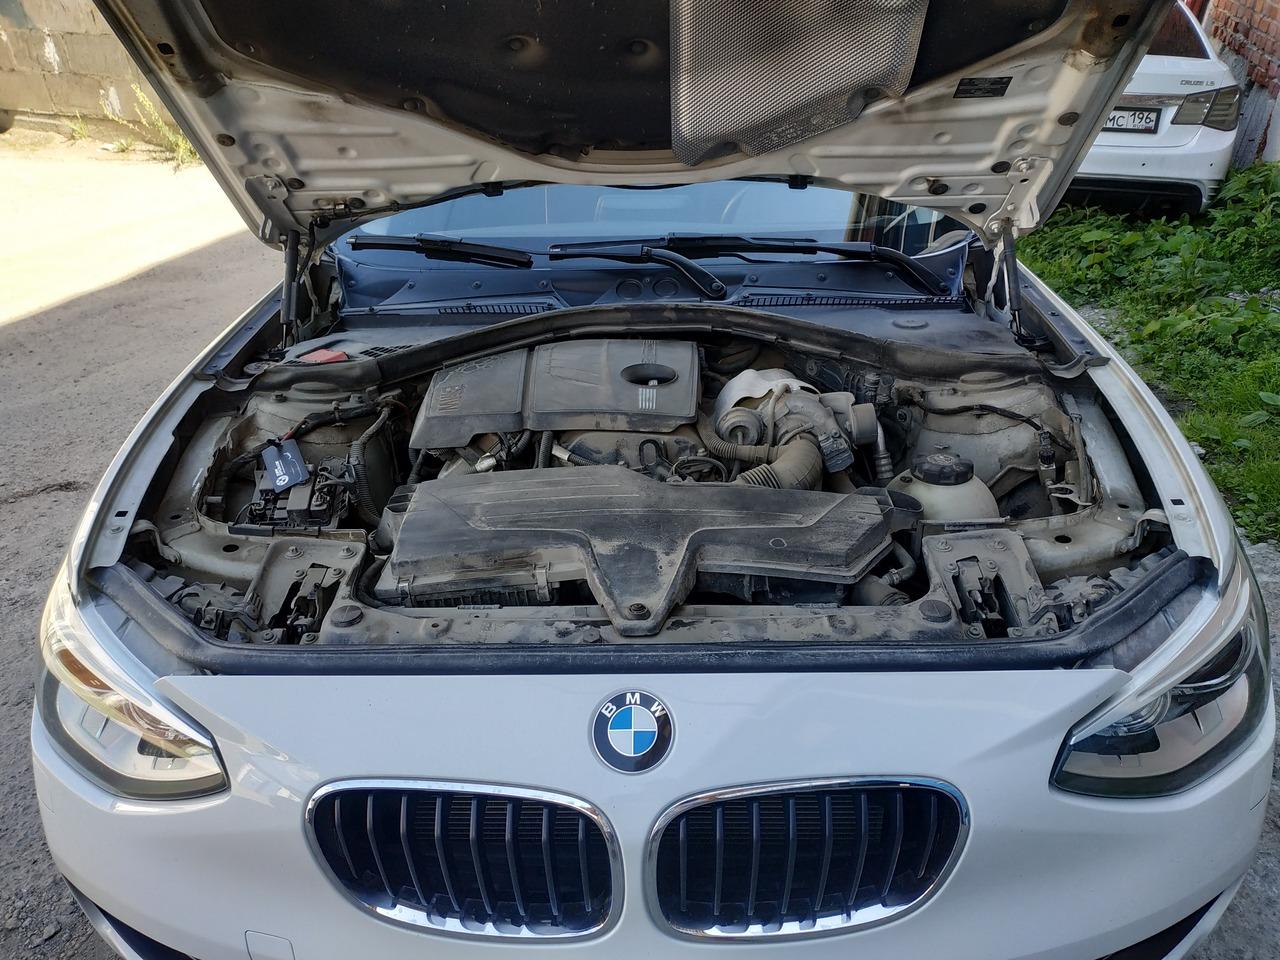 BMW F20 118i, двигатель N13